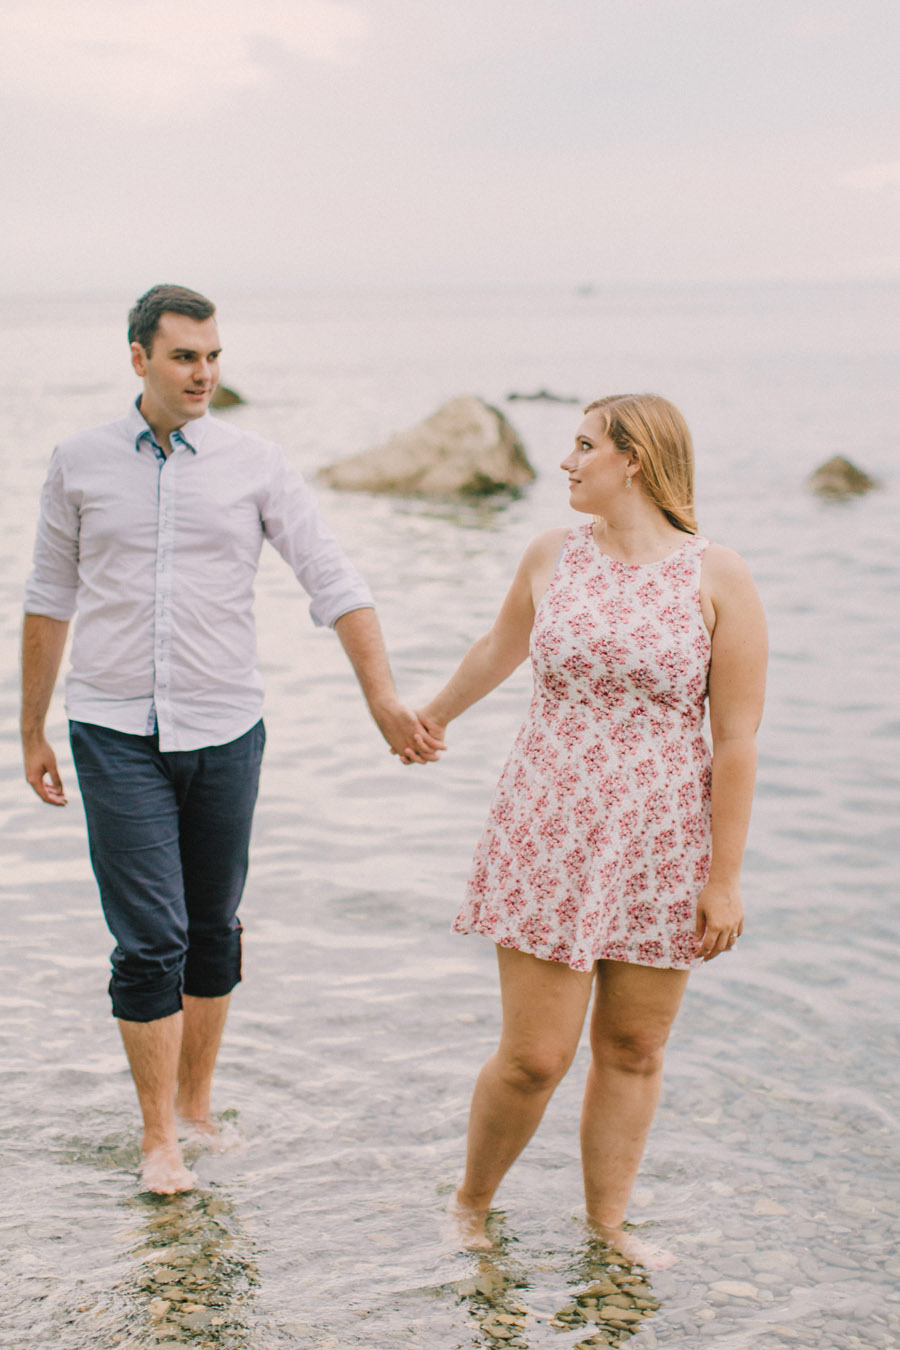 zarocno fotografiranje ob morju_seaside tuscany olive tree engagement couple session (22)